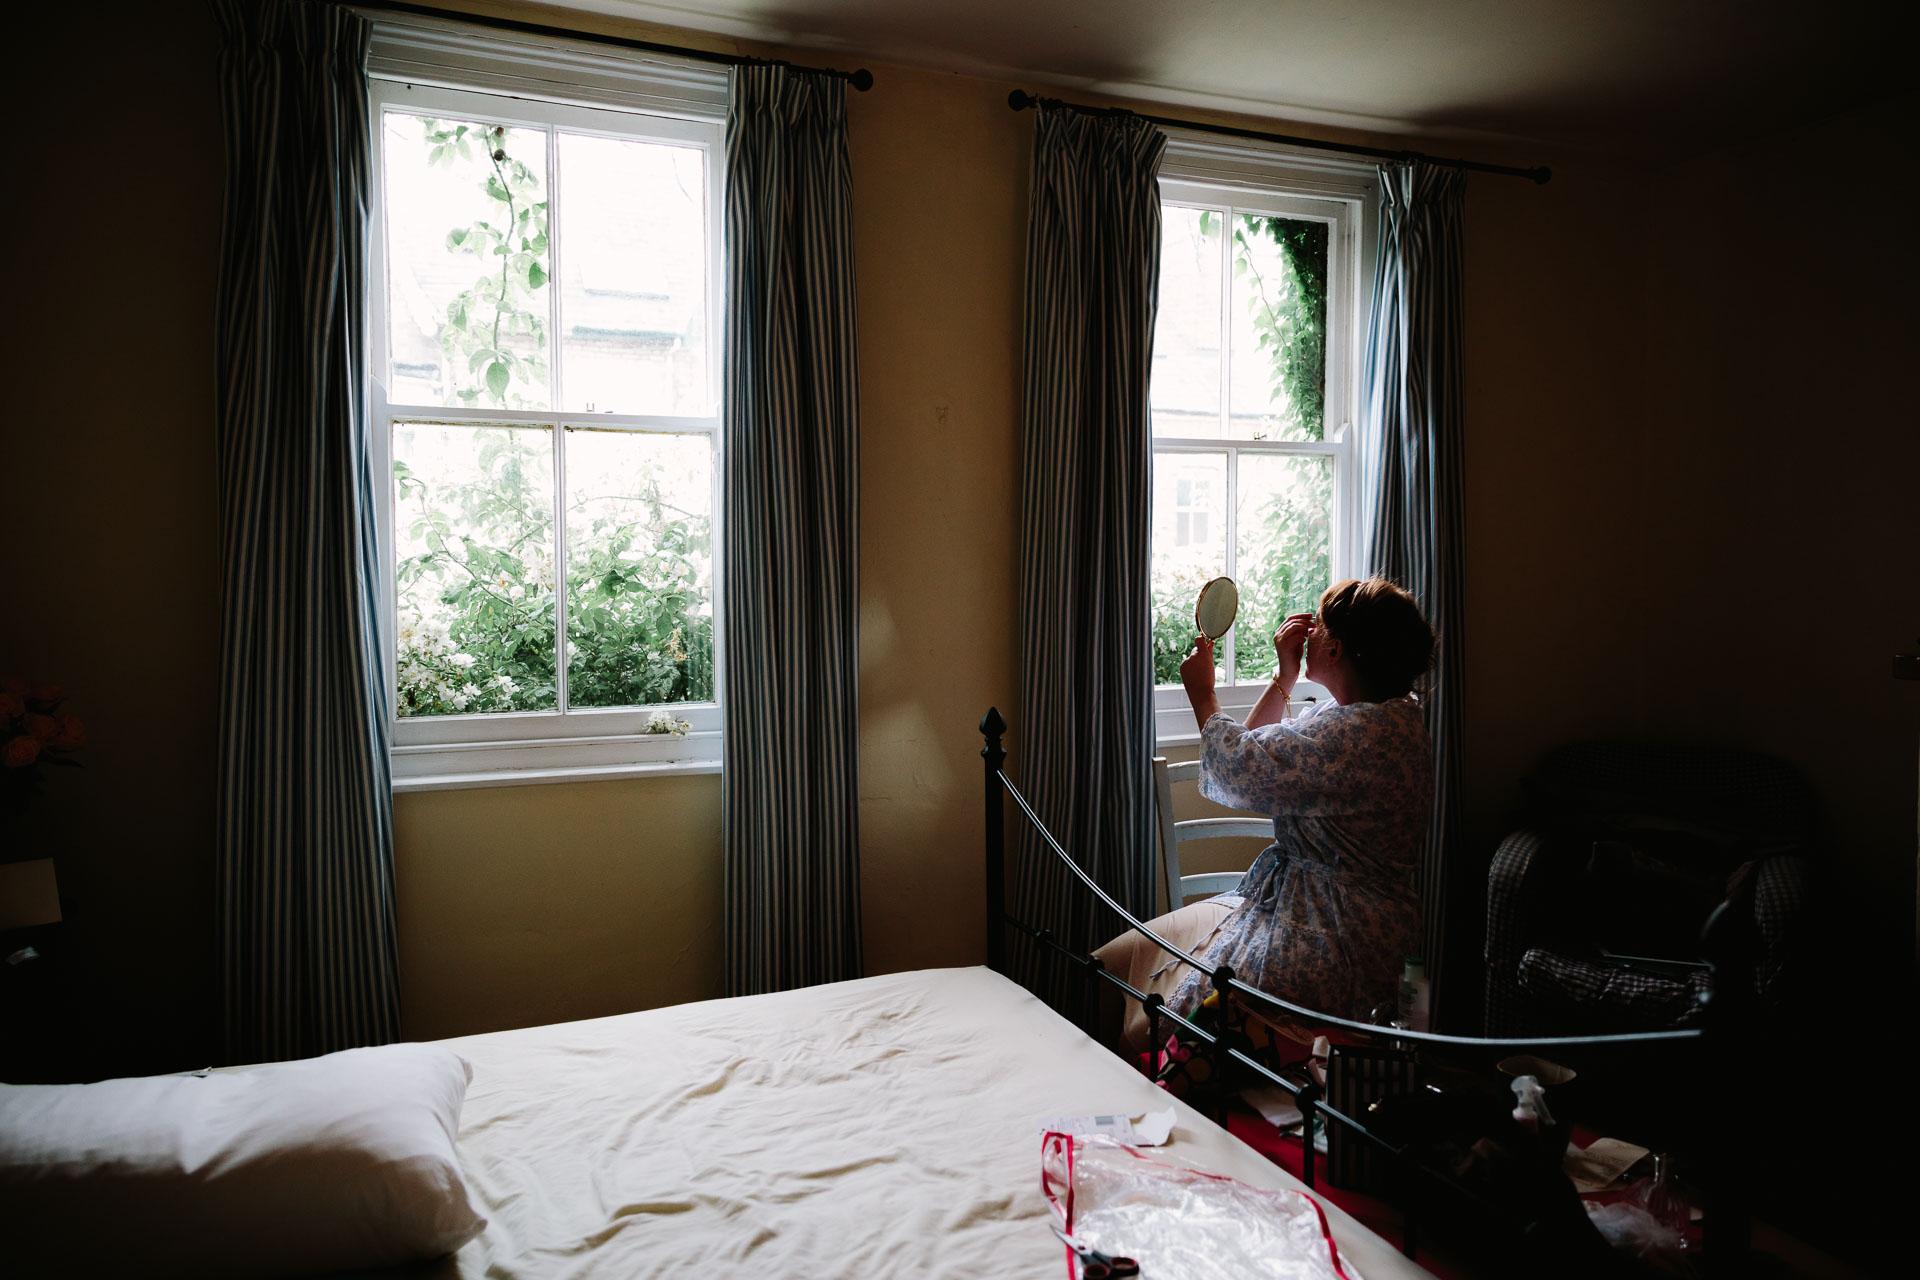 oxford wedding photographer - Philippa James